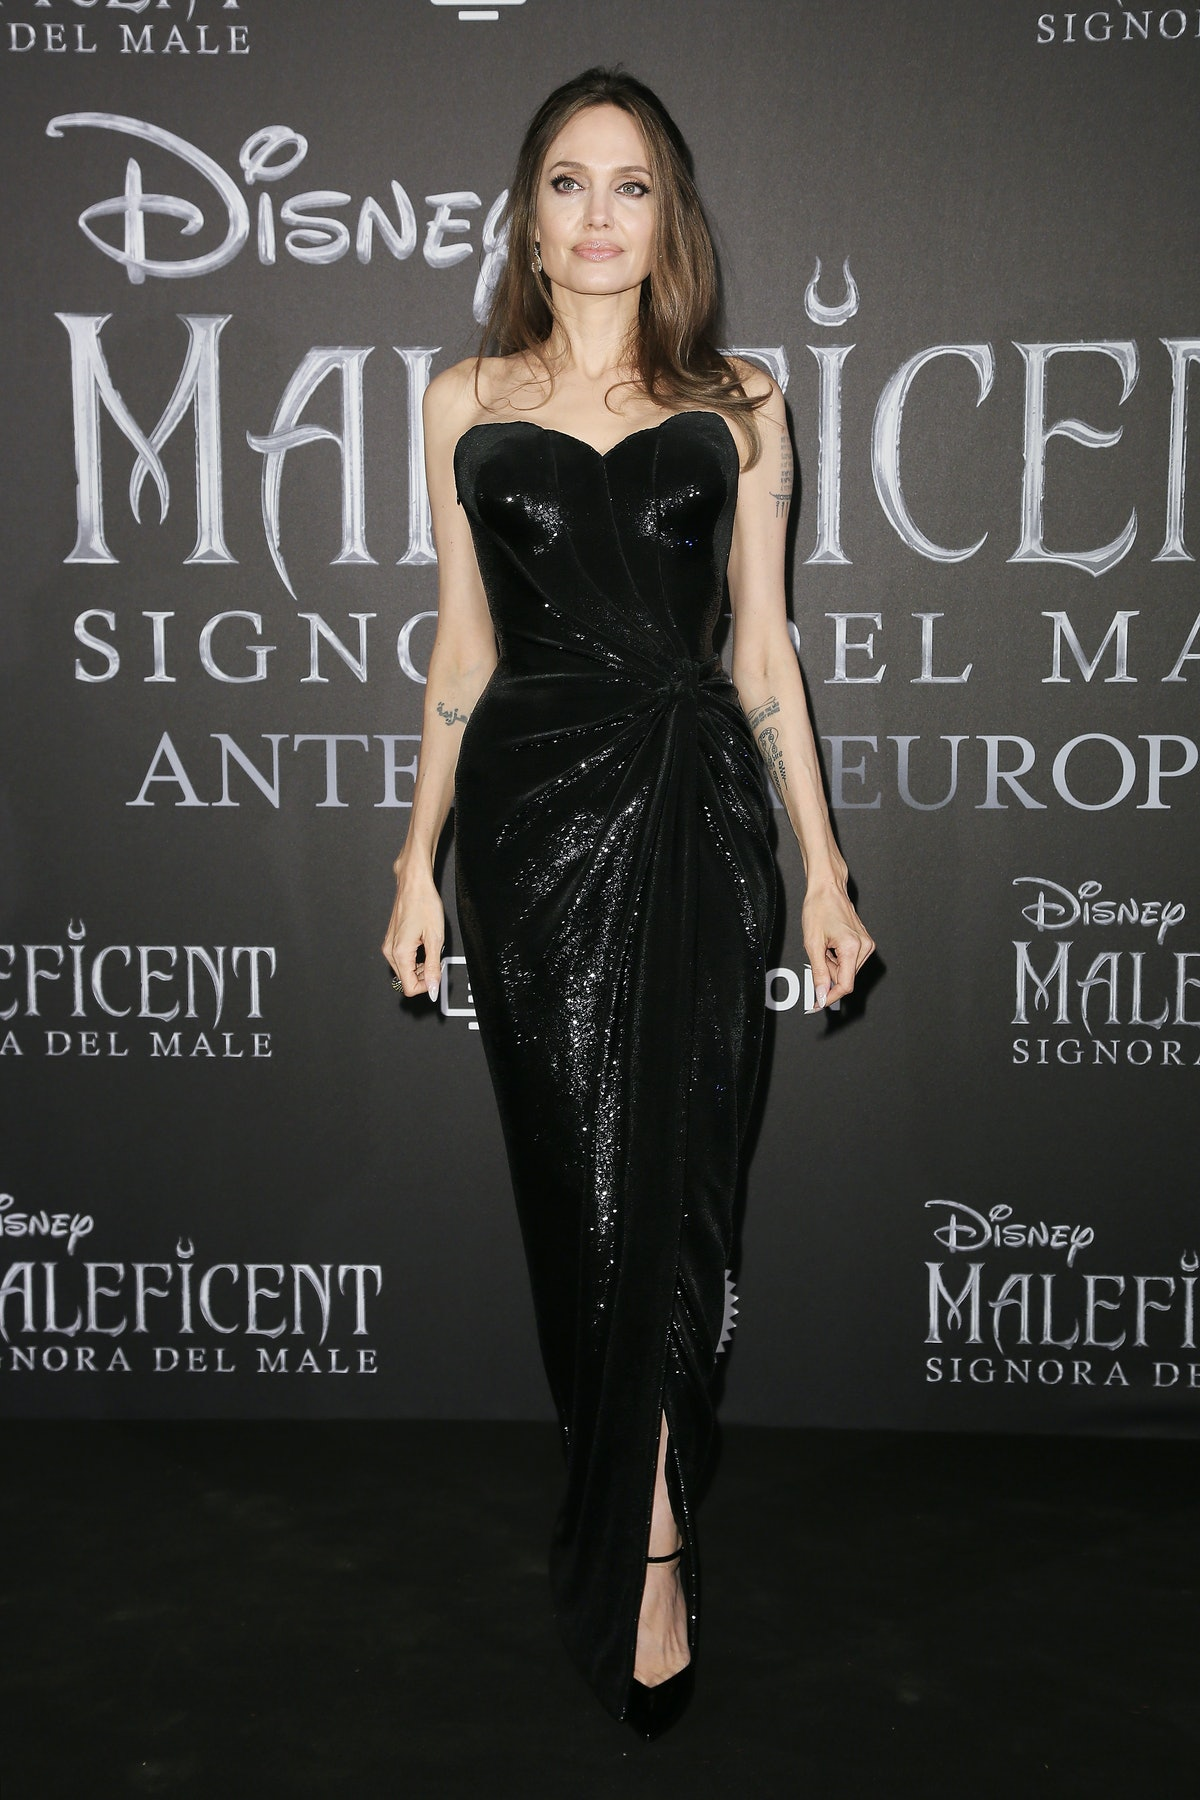 Angelina Jolie in a black dress